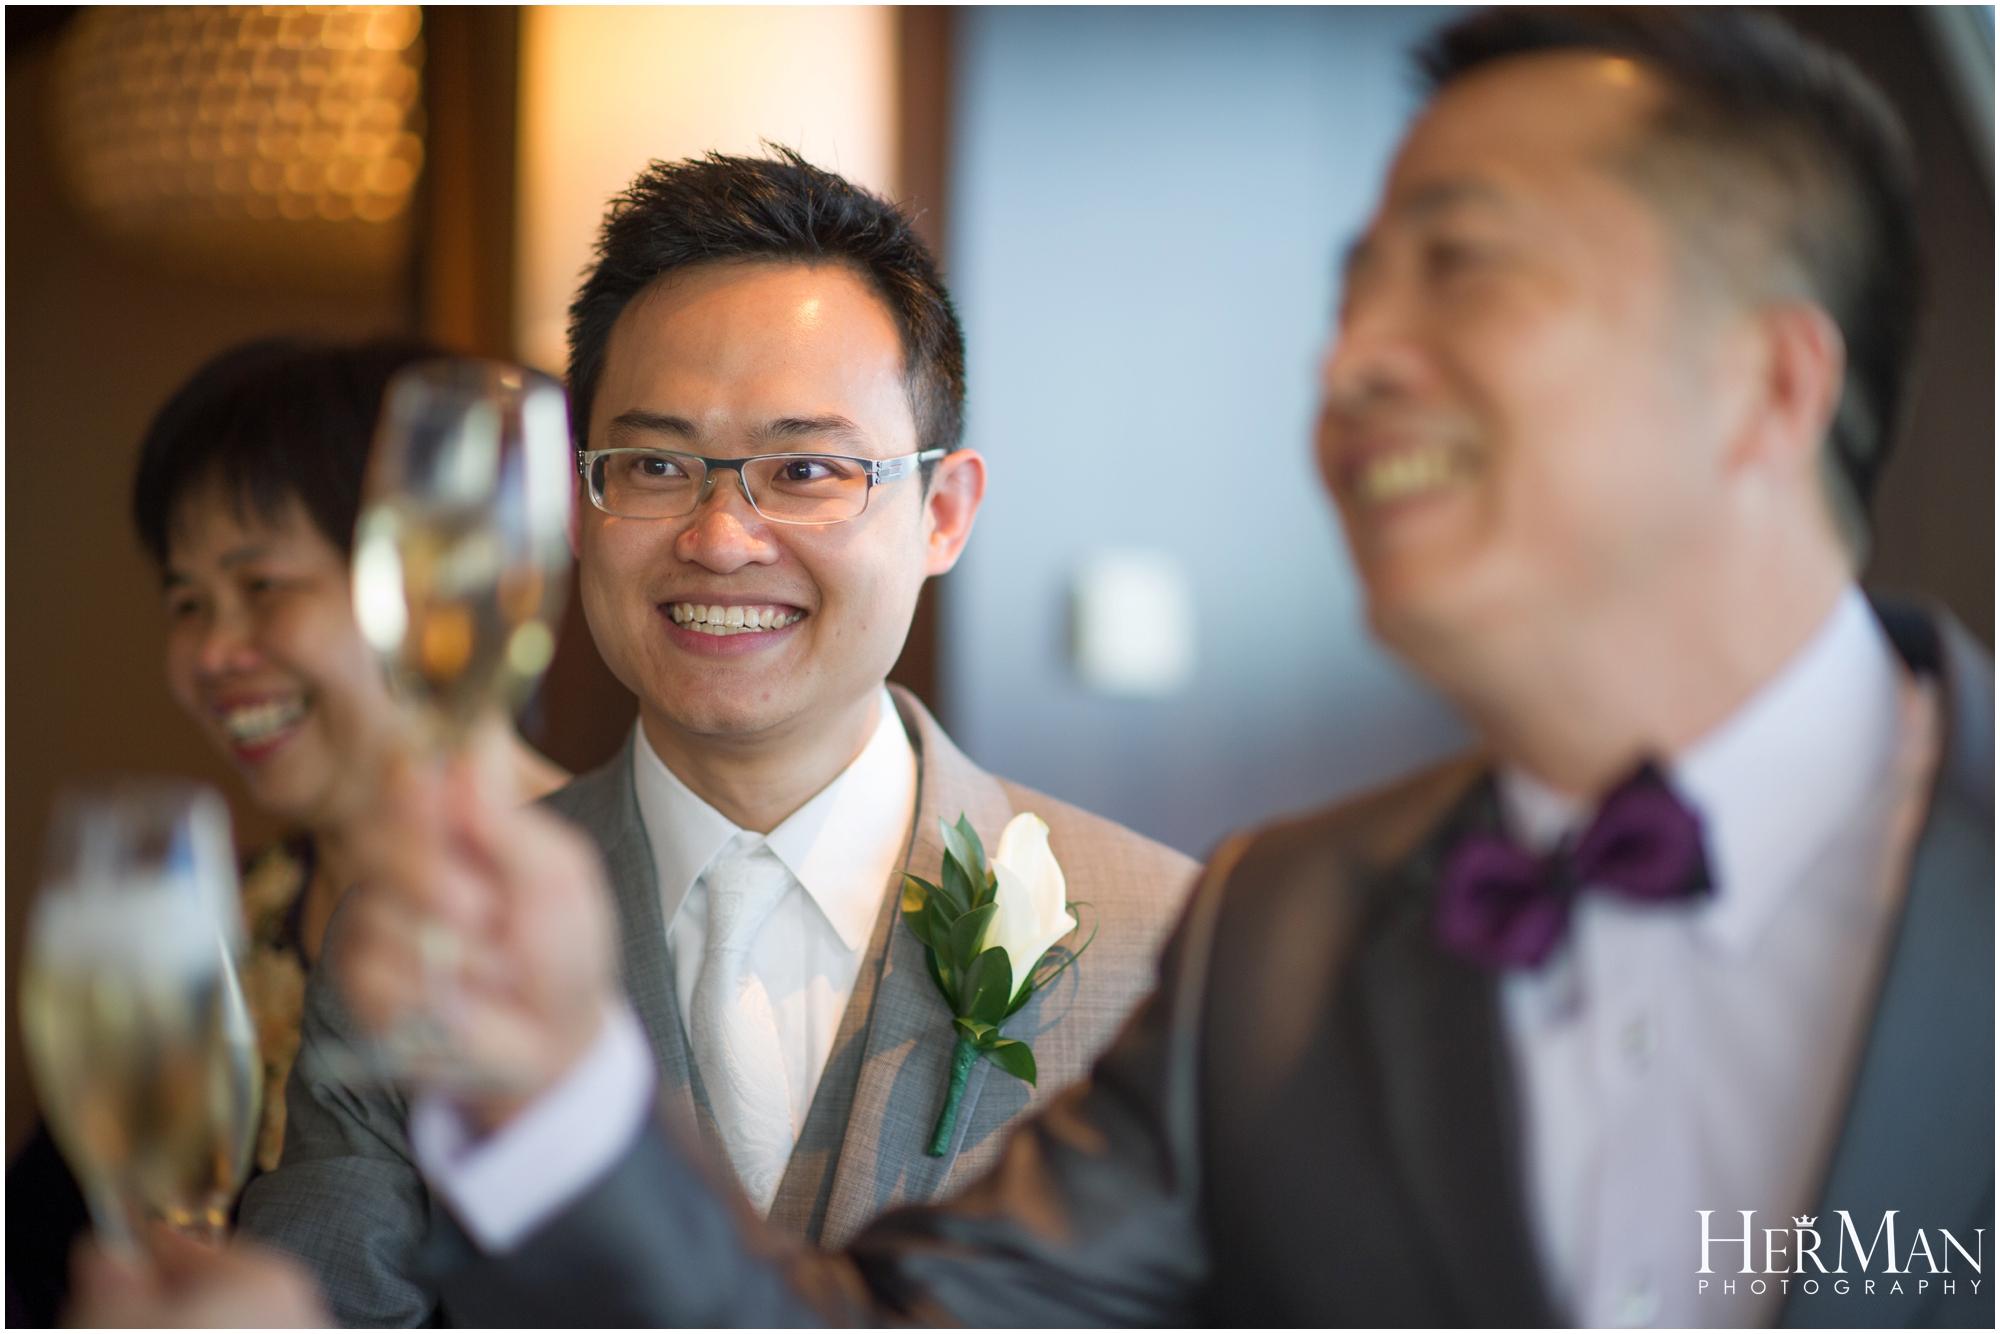 disney-fantasy-cruise-wedding-HerMan-photography_0032.jpg